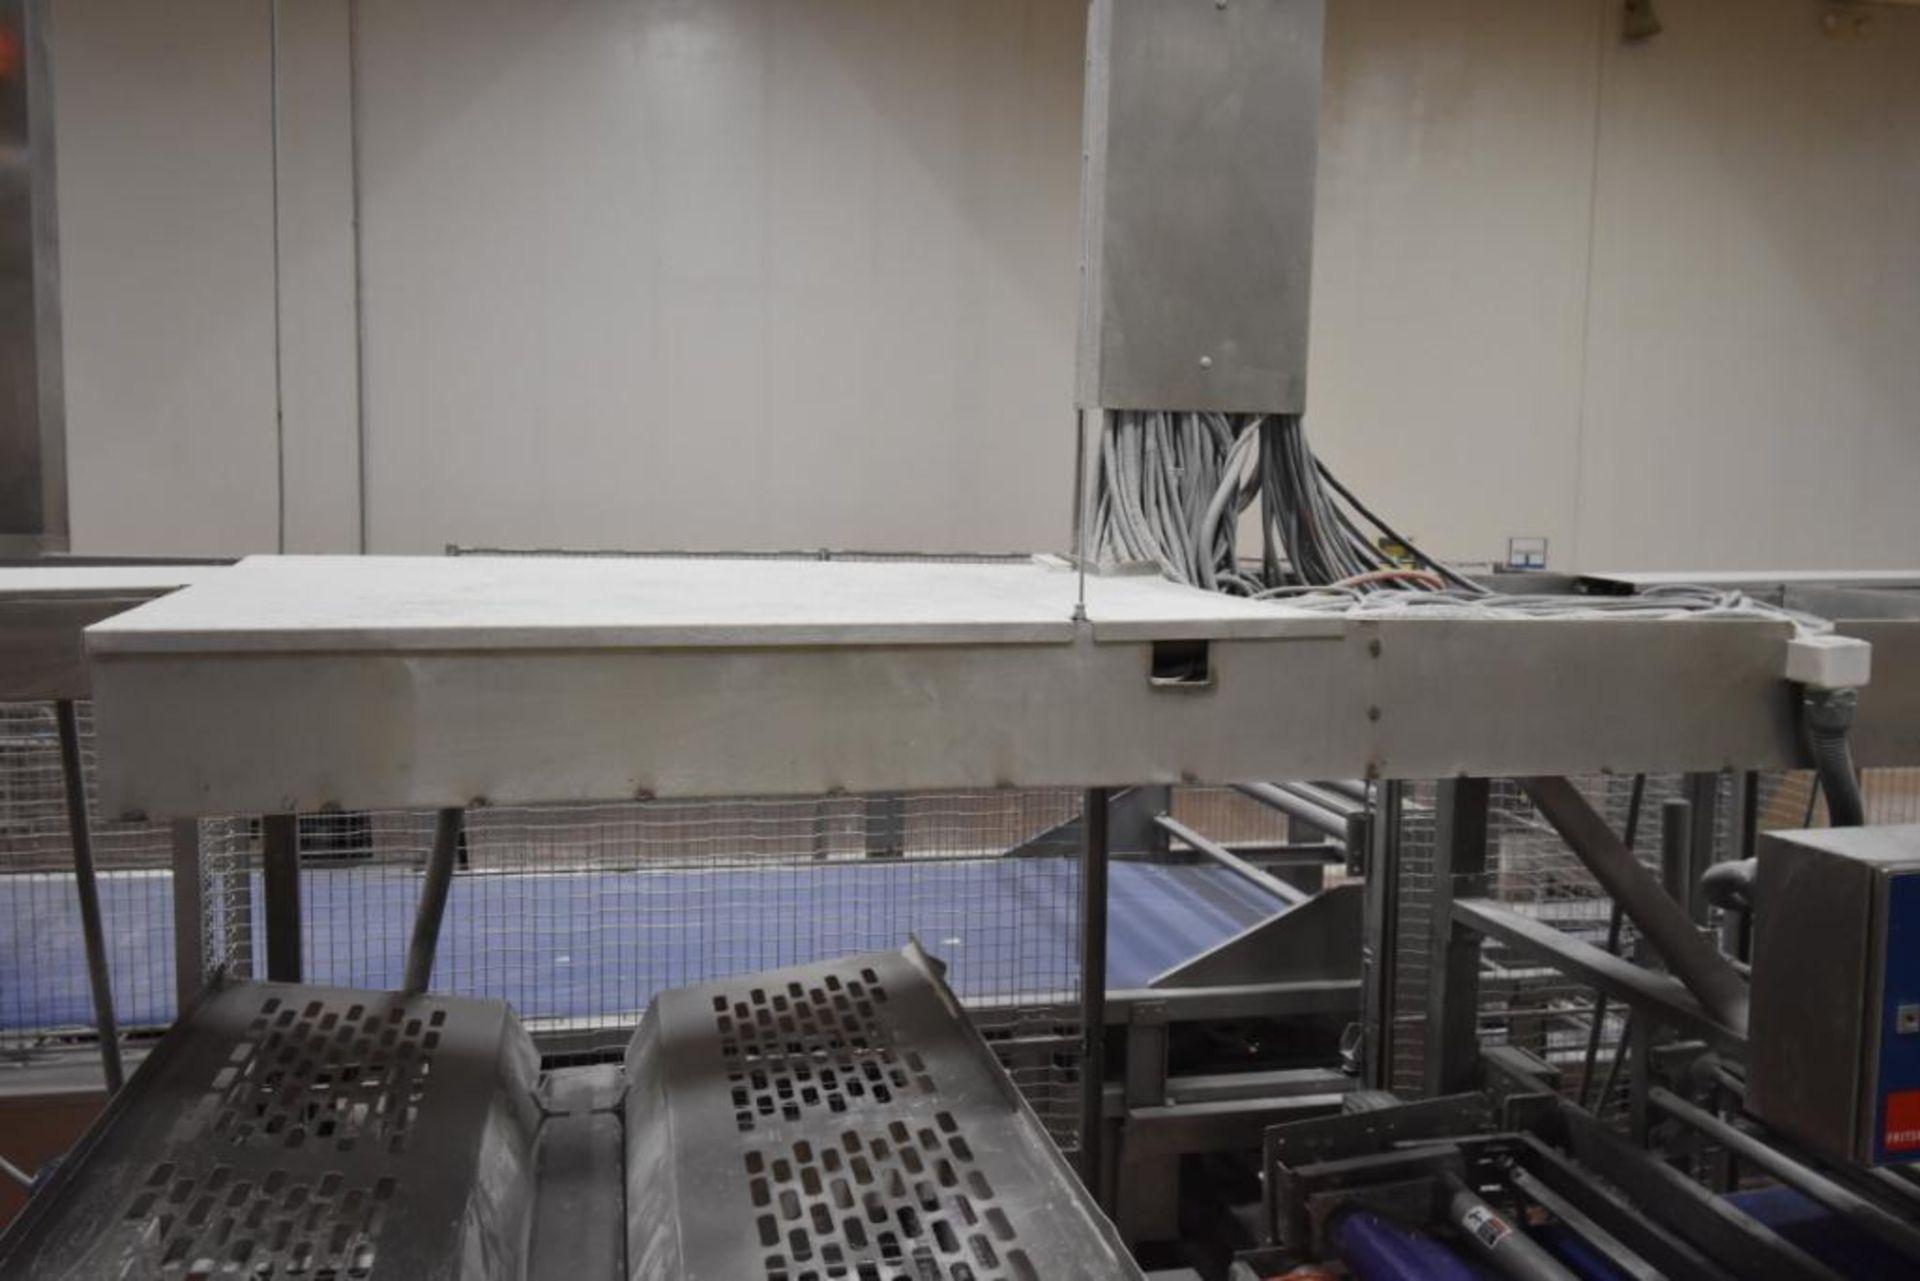 2007 Fritsch Laminator 3000 dough line - Image 233 of 280